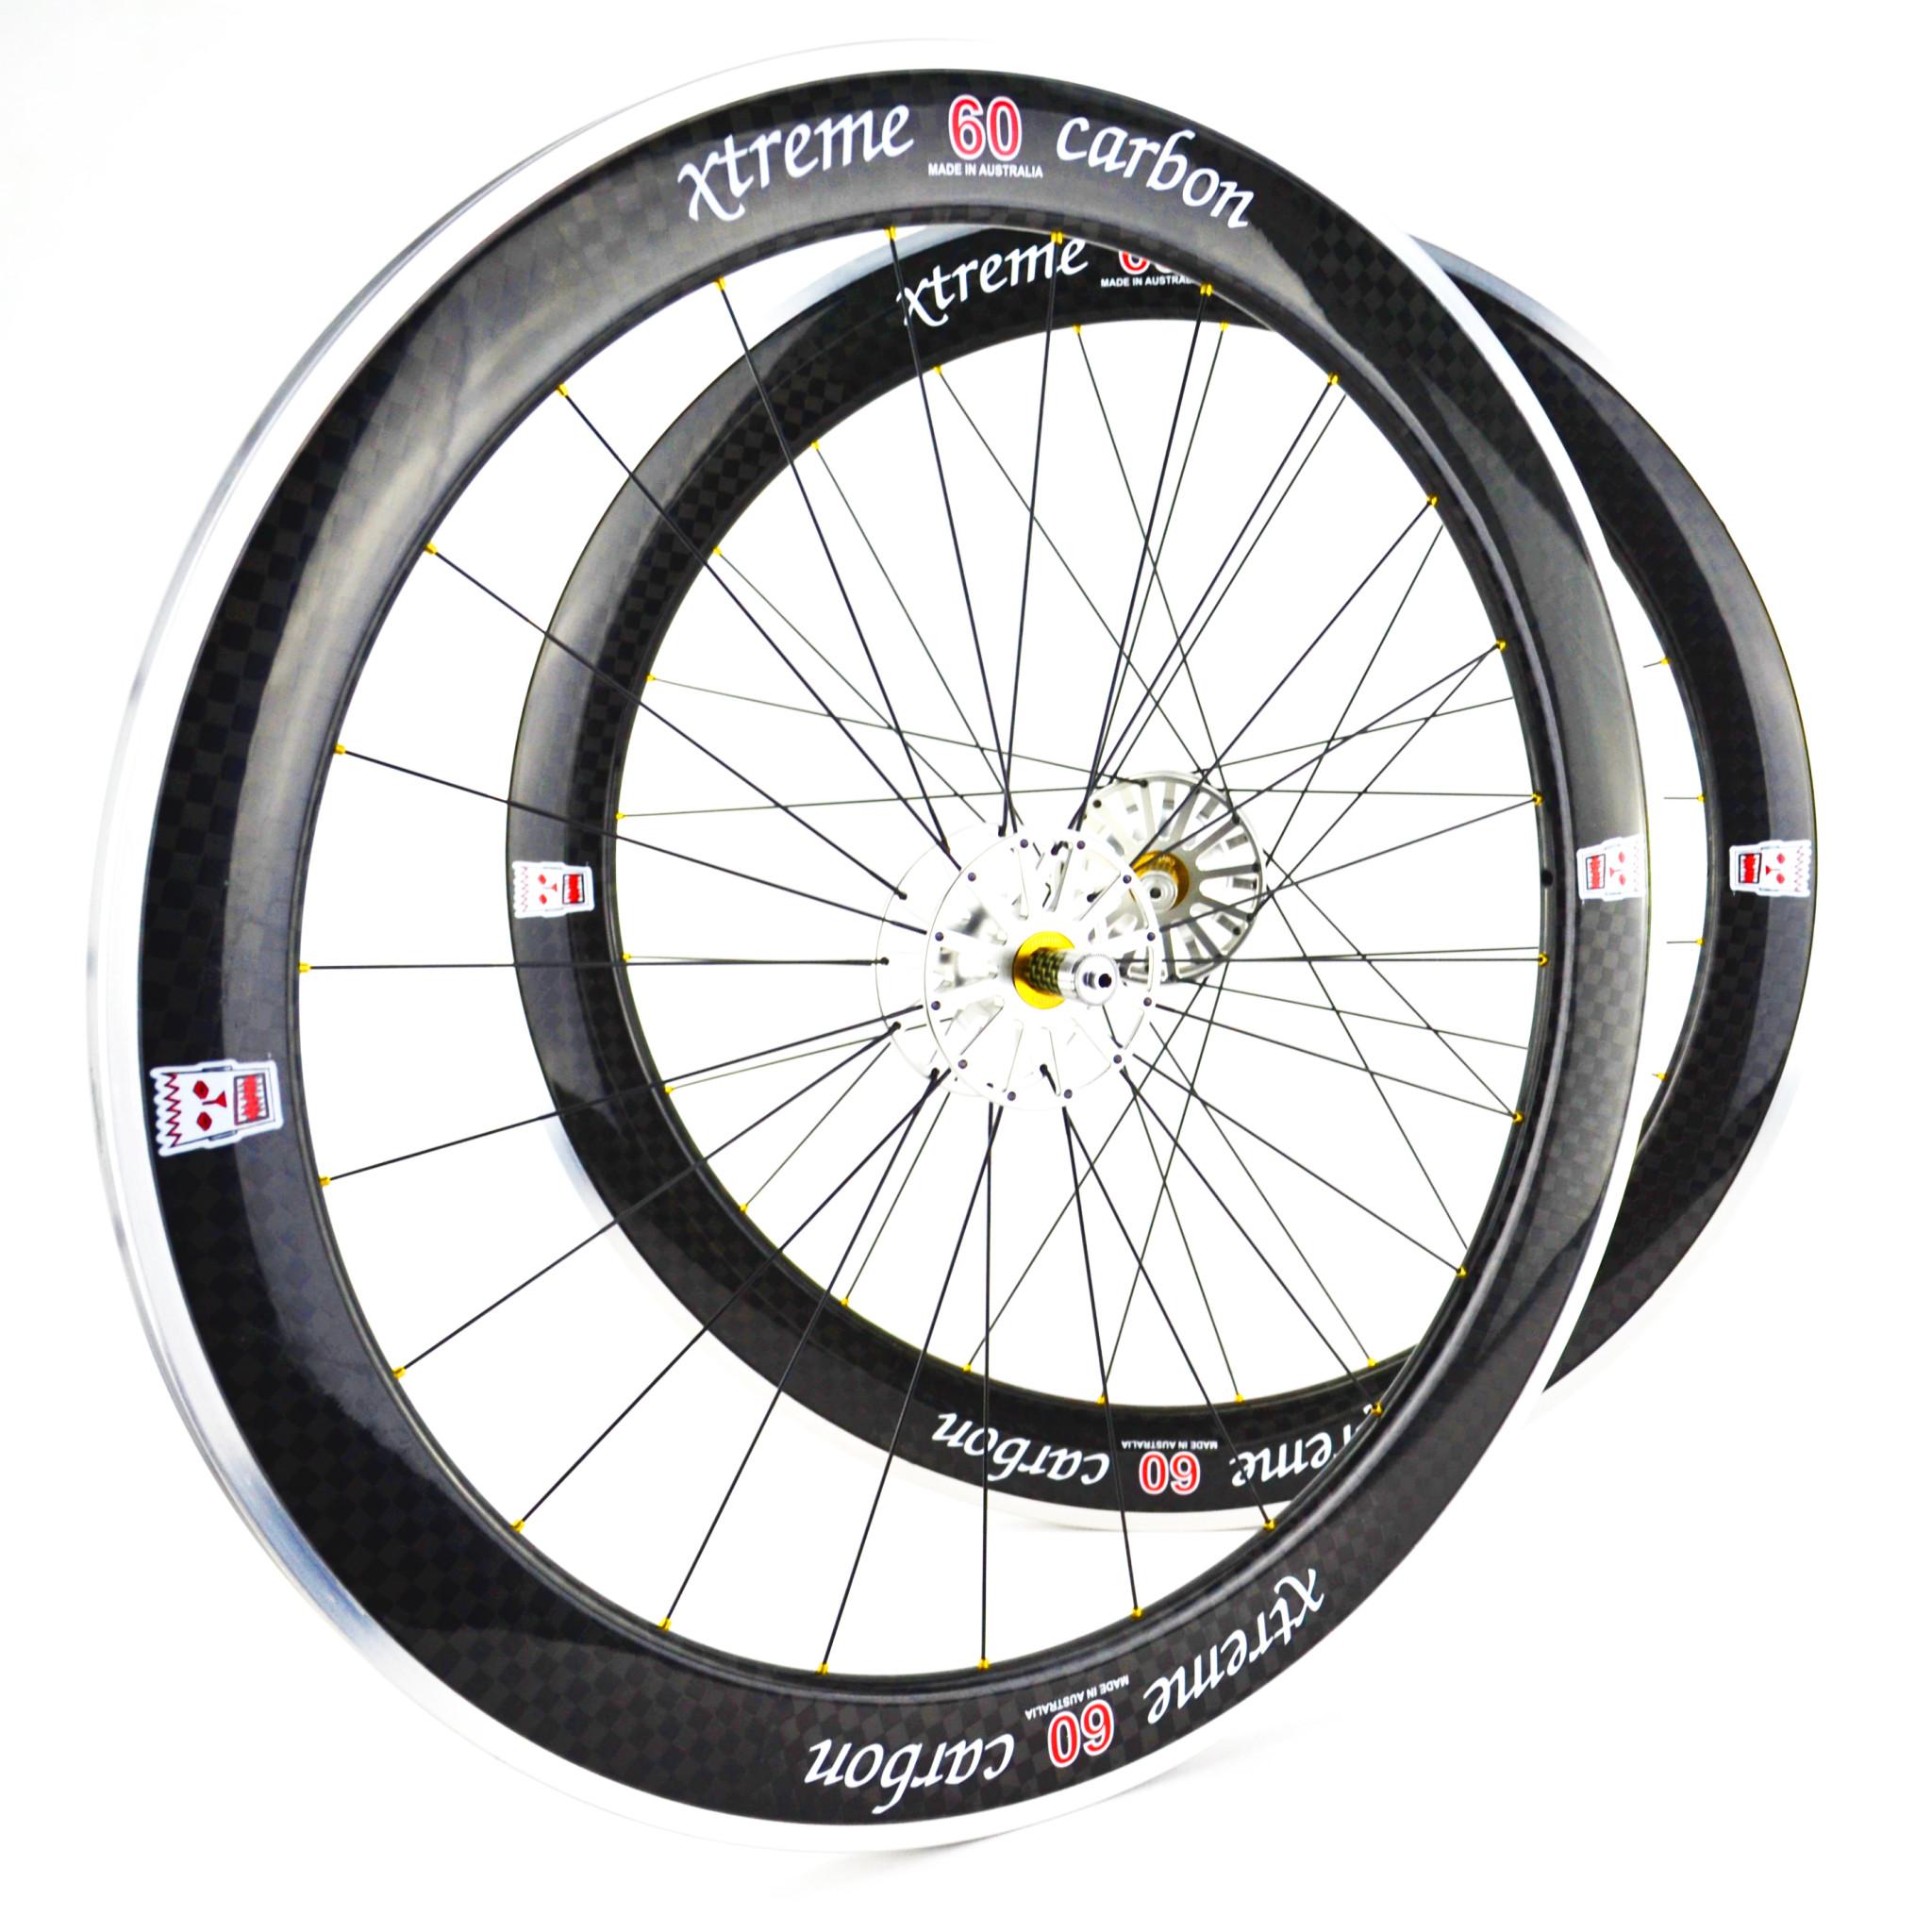 Triathlon Wheels Australia Wide